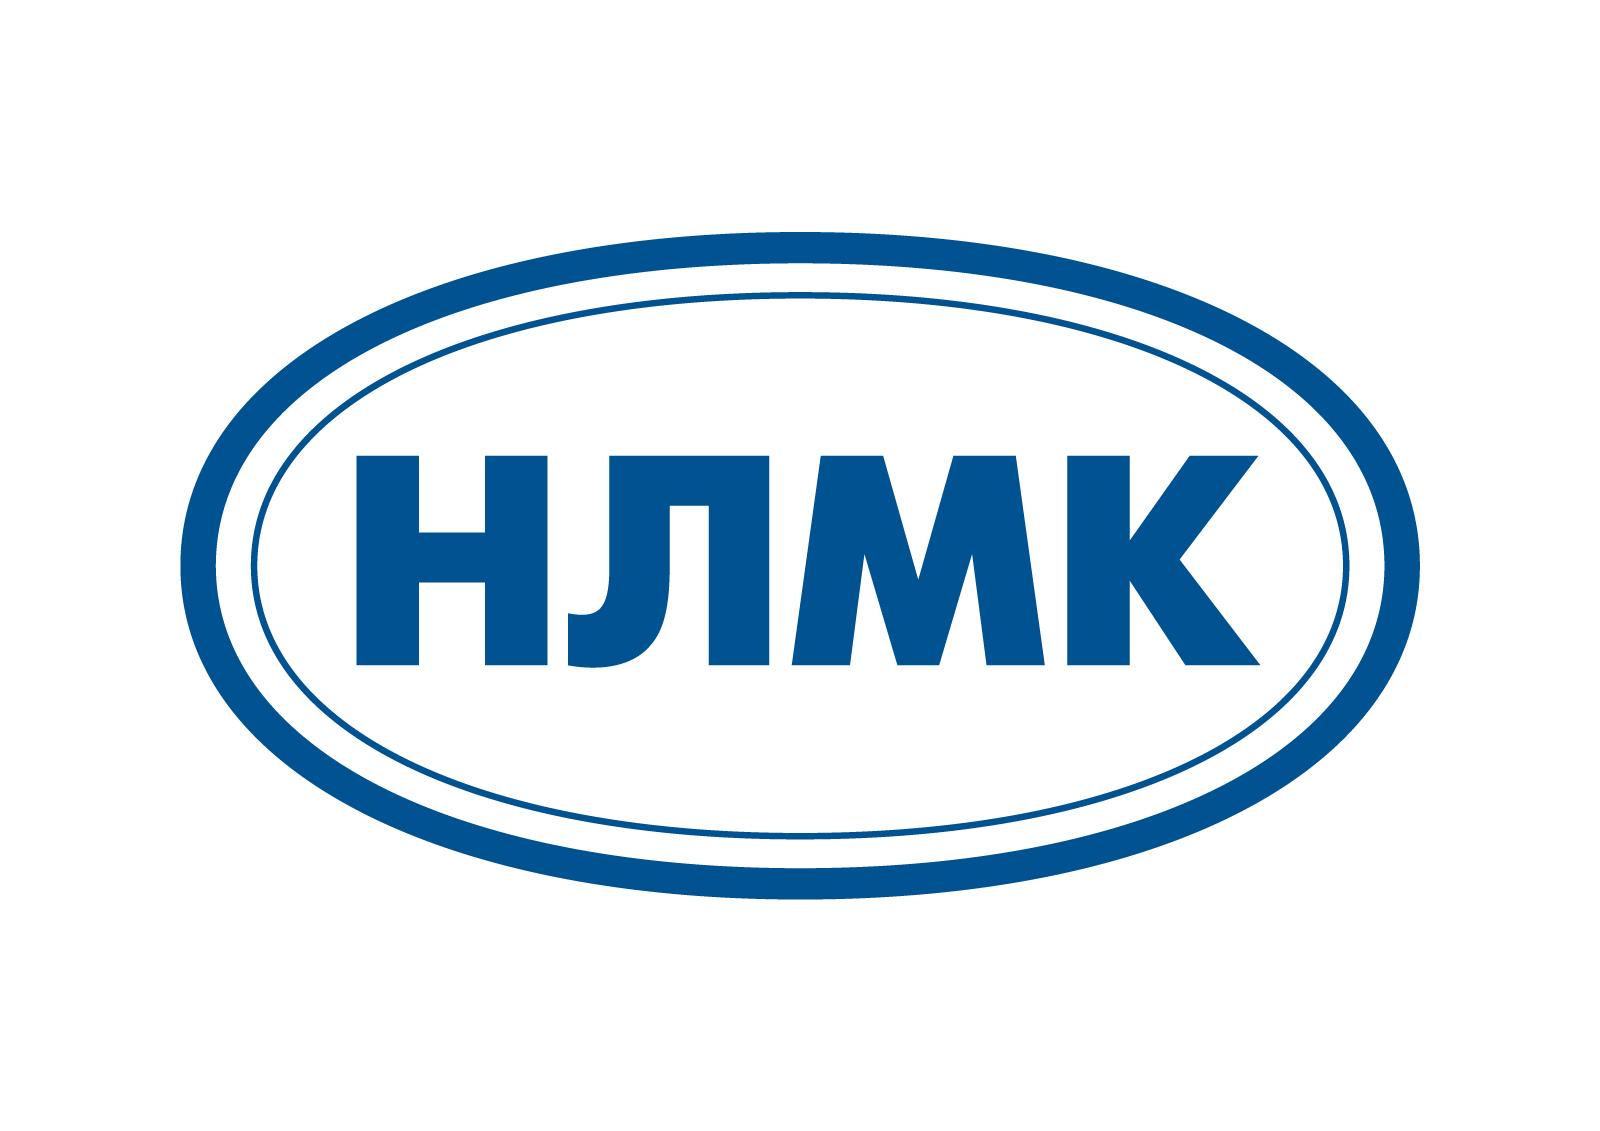 https://upload.wikimedia.org/wikipedia/commons/2/24/NLMK_logo_new